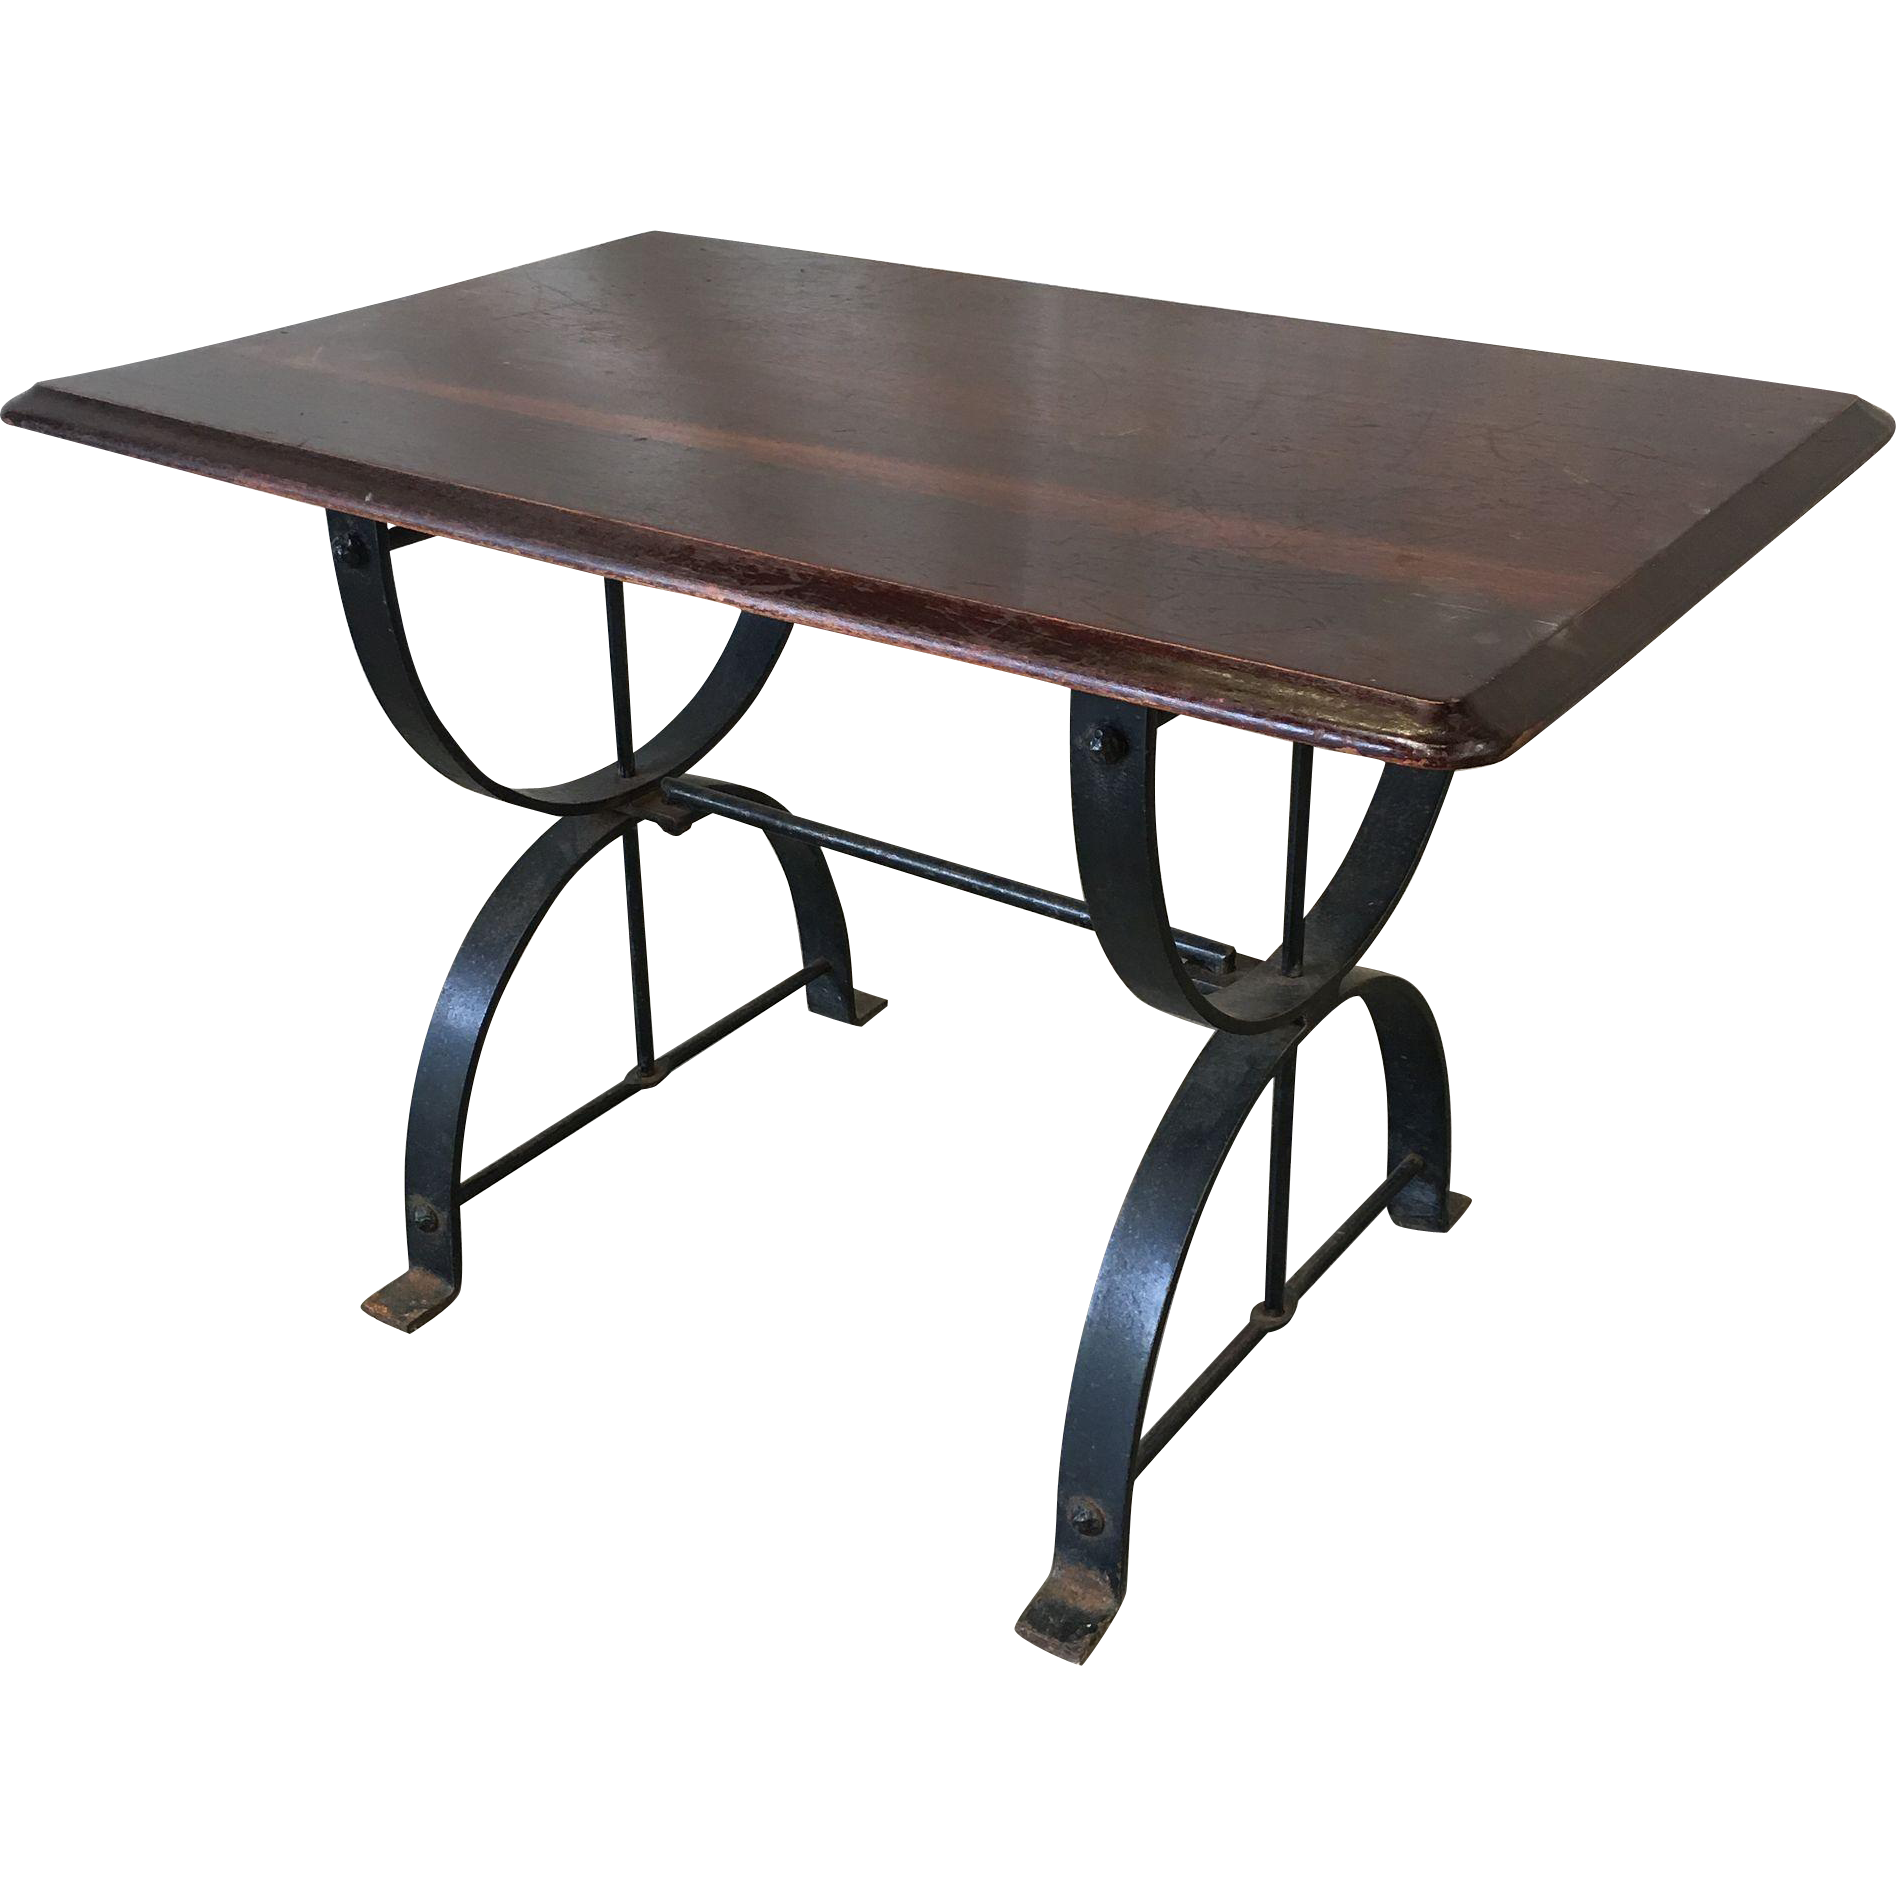 English Antique Pub Table Sofa Table Console Table